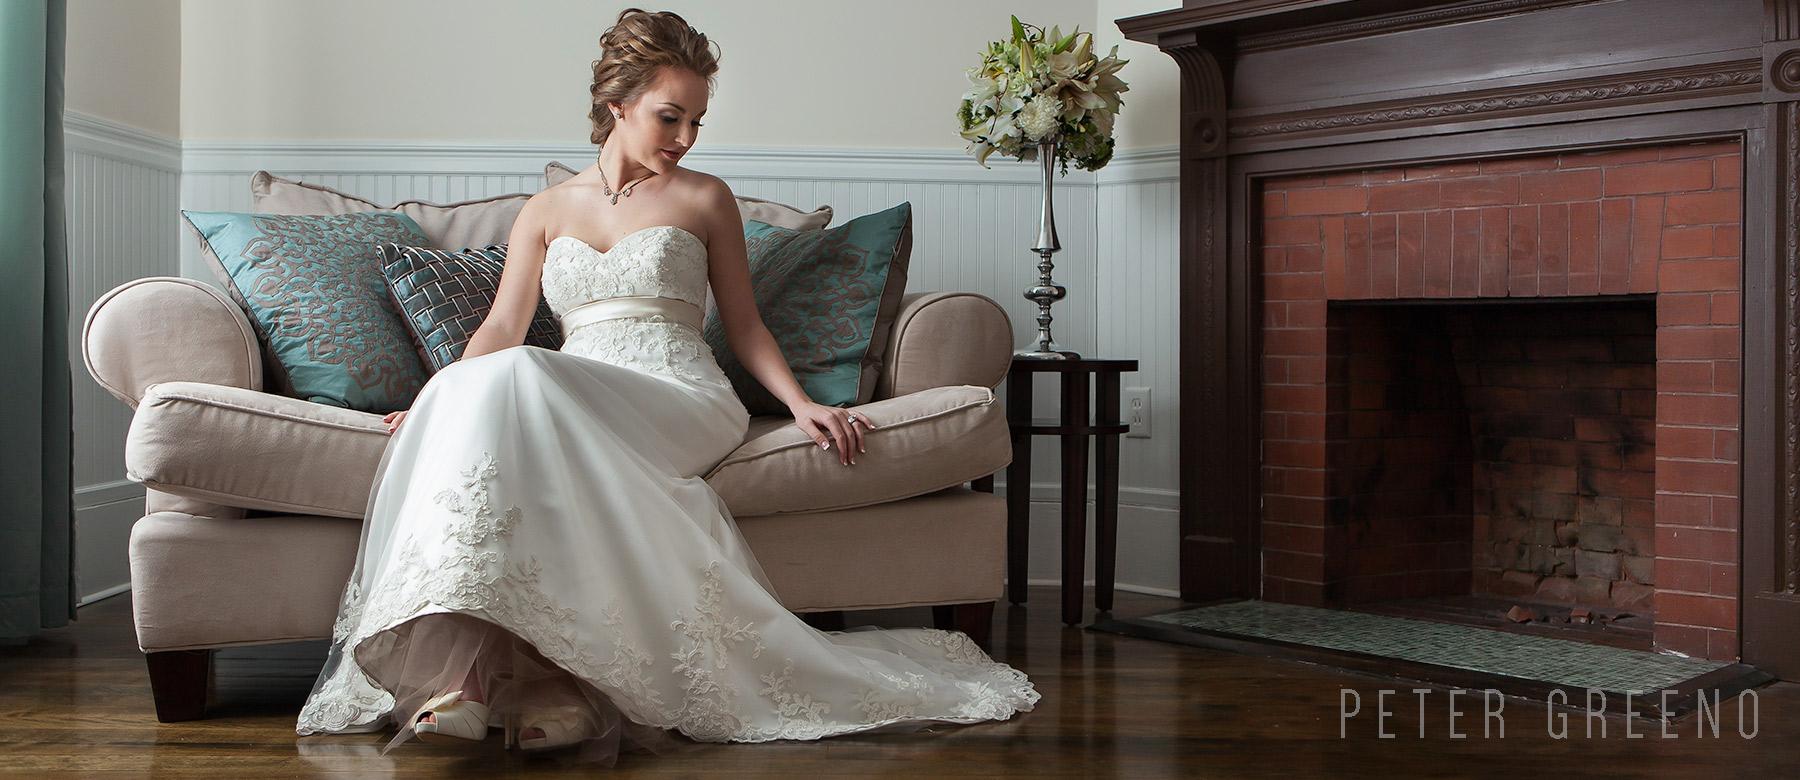 Nonantum Wedding Photography